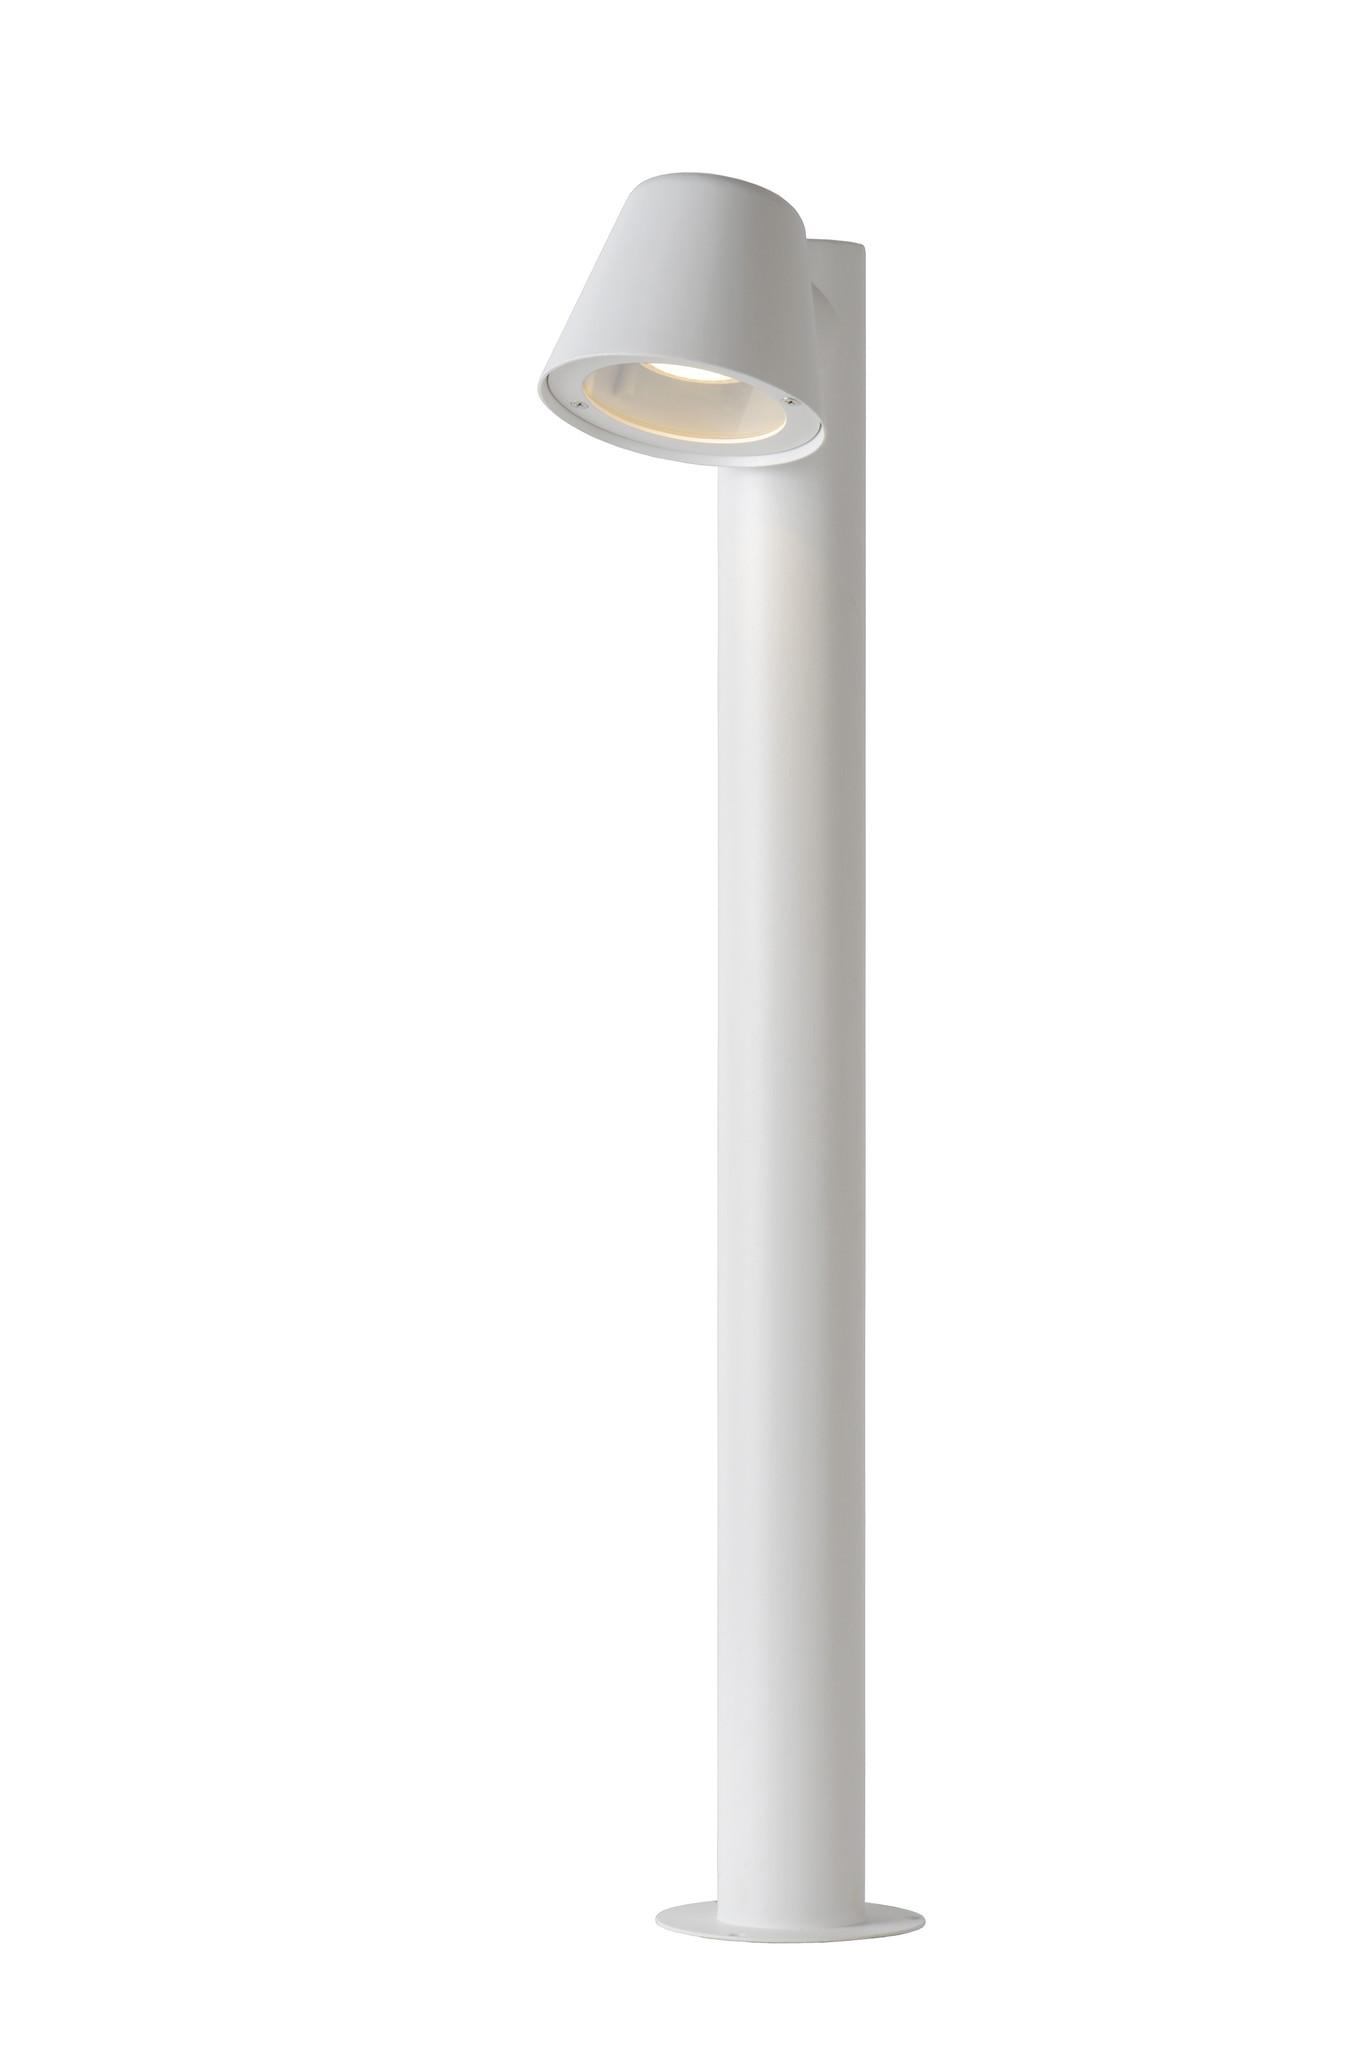 Lucide DINGO LED Paaltje IP44 H70cm GU10/4.5W incl Wit